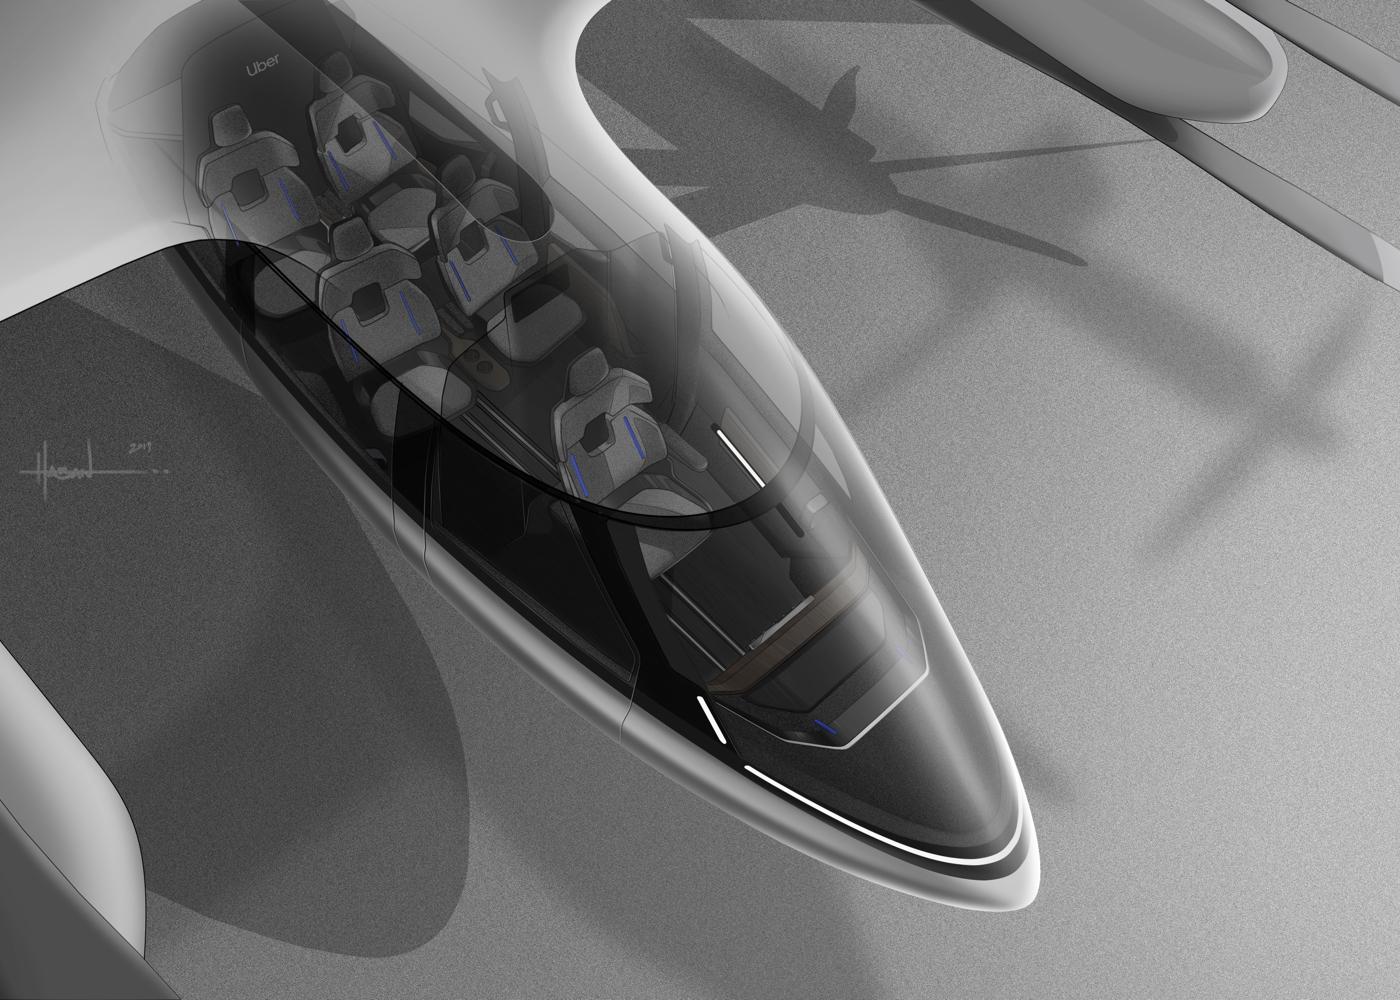 Hyundai SA-1 eVTOL air taxi cabin